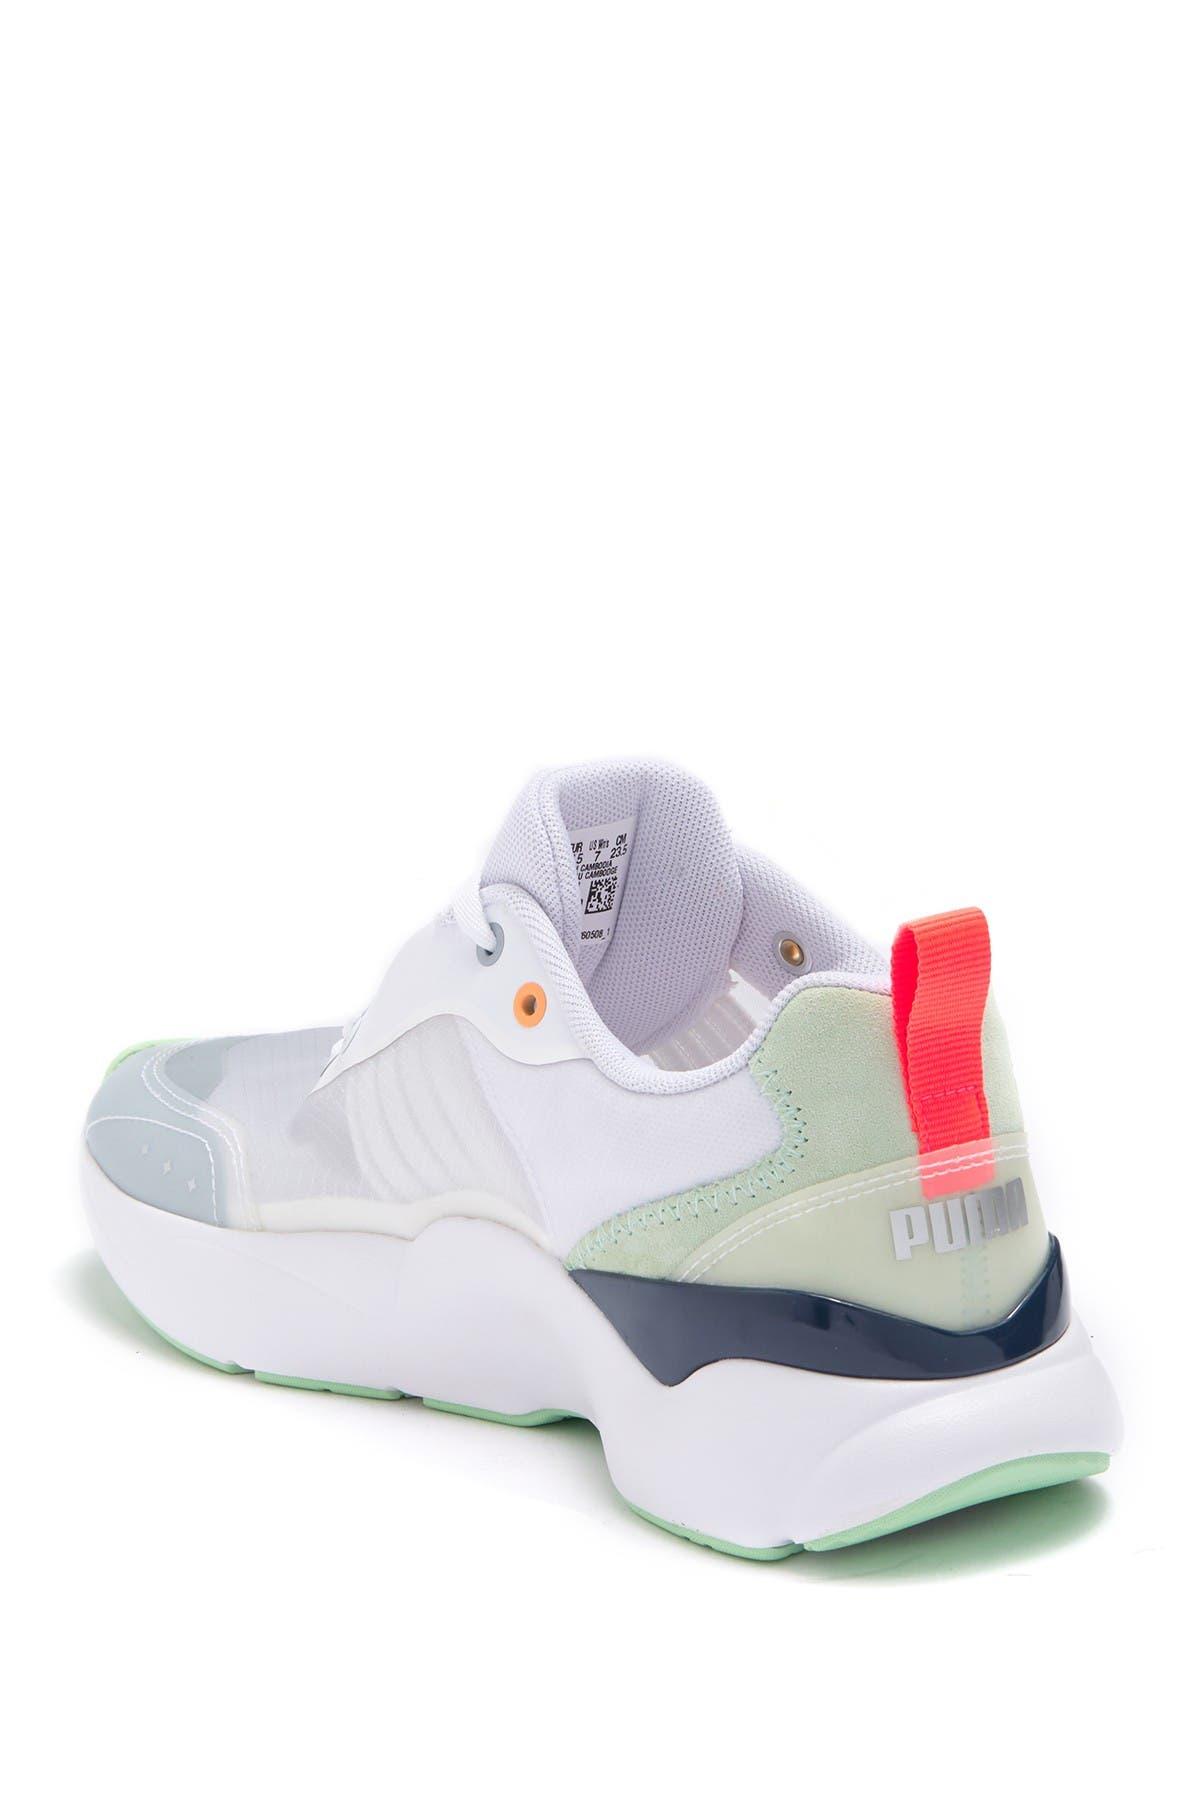 Image of PUMA Lia Sheer Sneaker